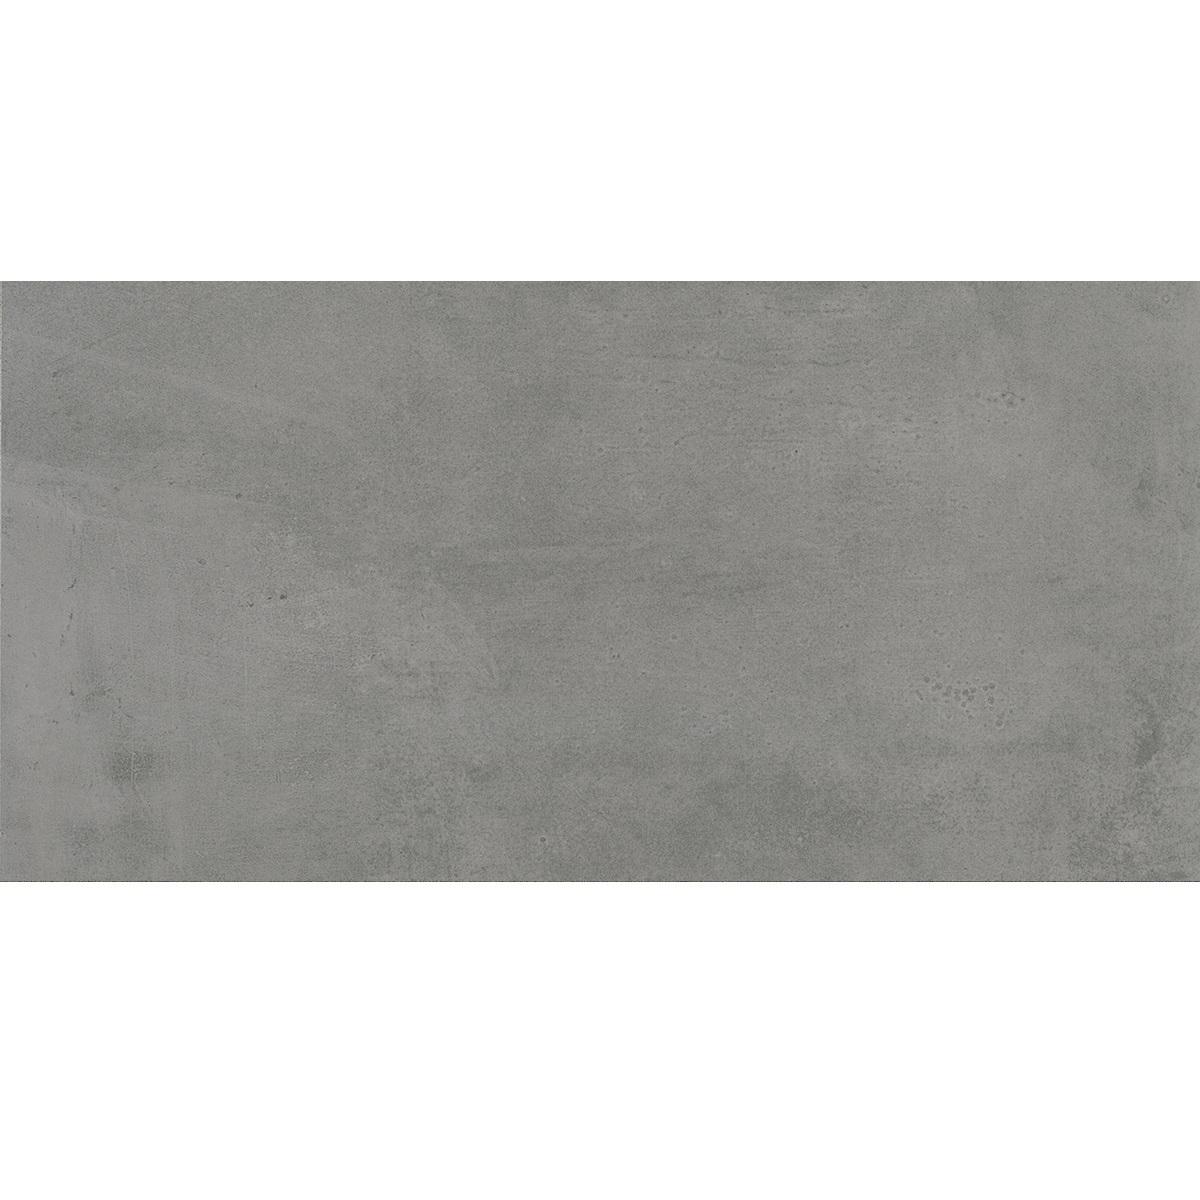 stark carrelage int rieur sol et mur 30x60 grey effet b ton. Black Bedroom Furniture Sets. Home Design Ideas